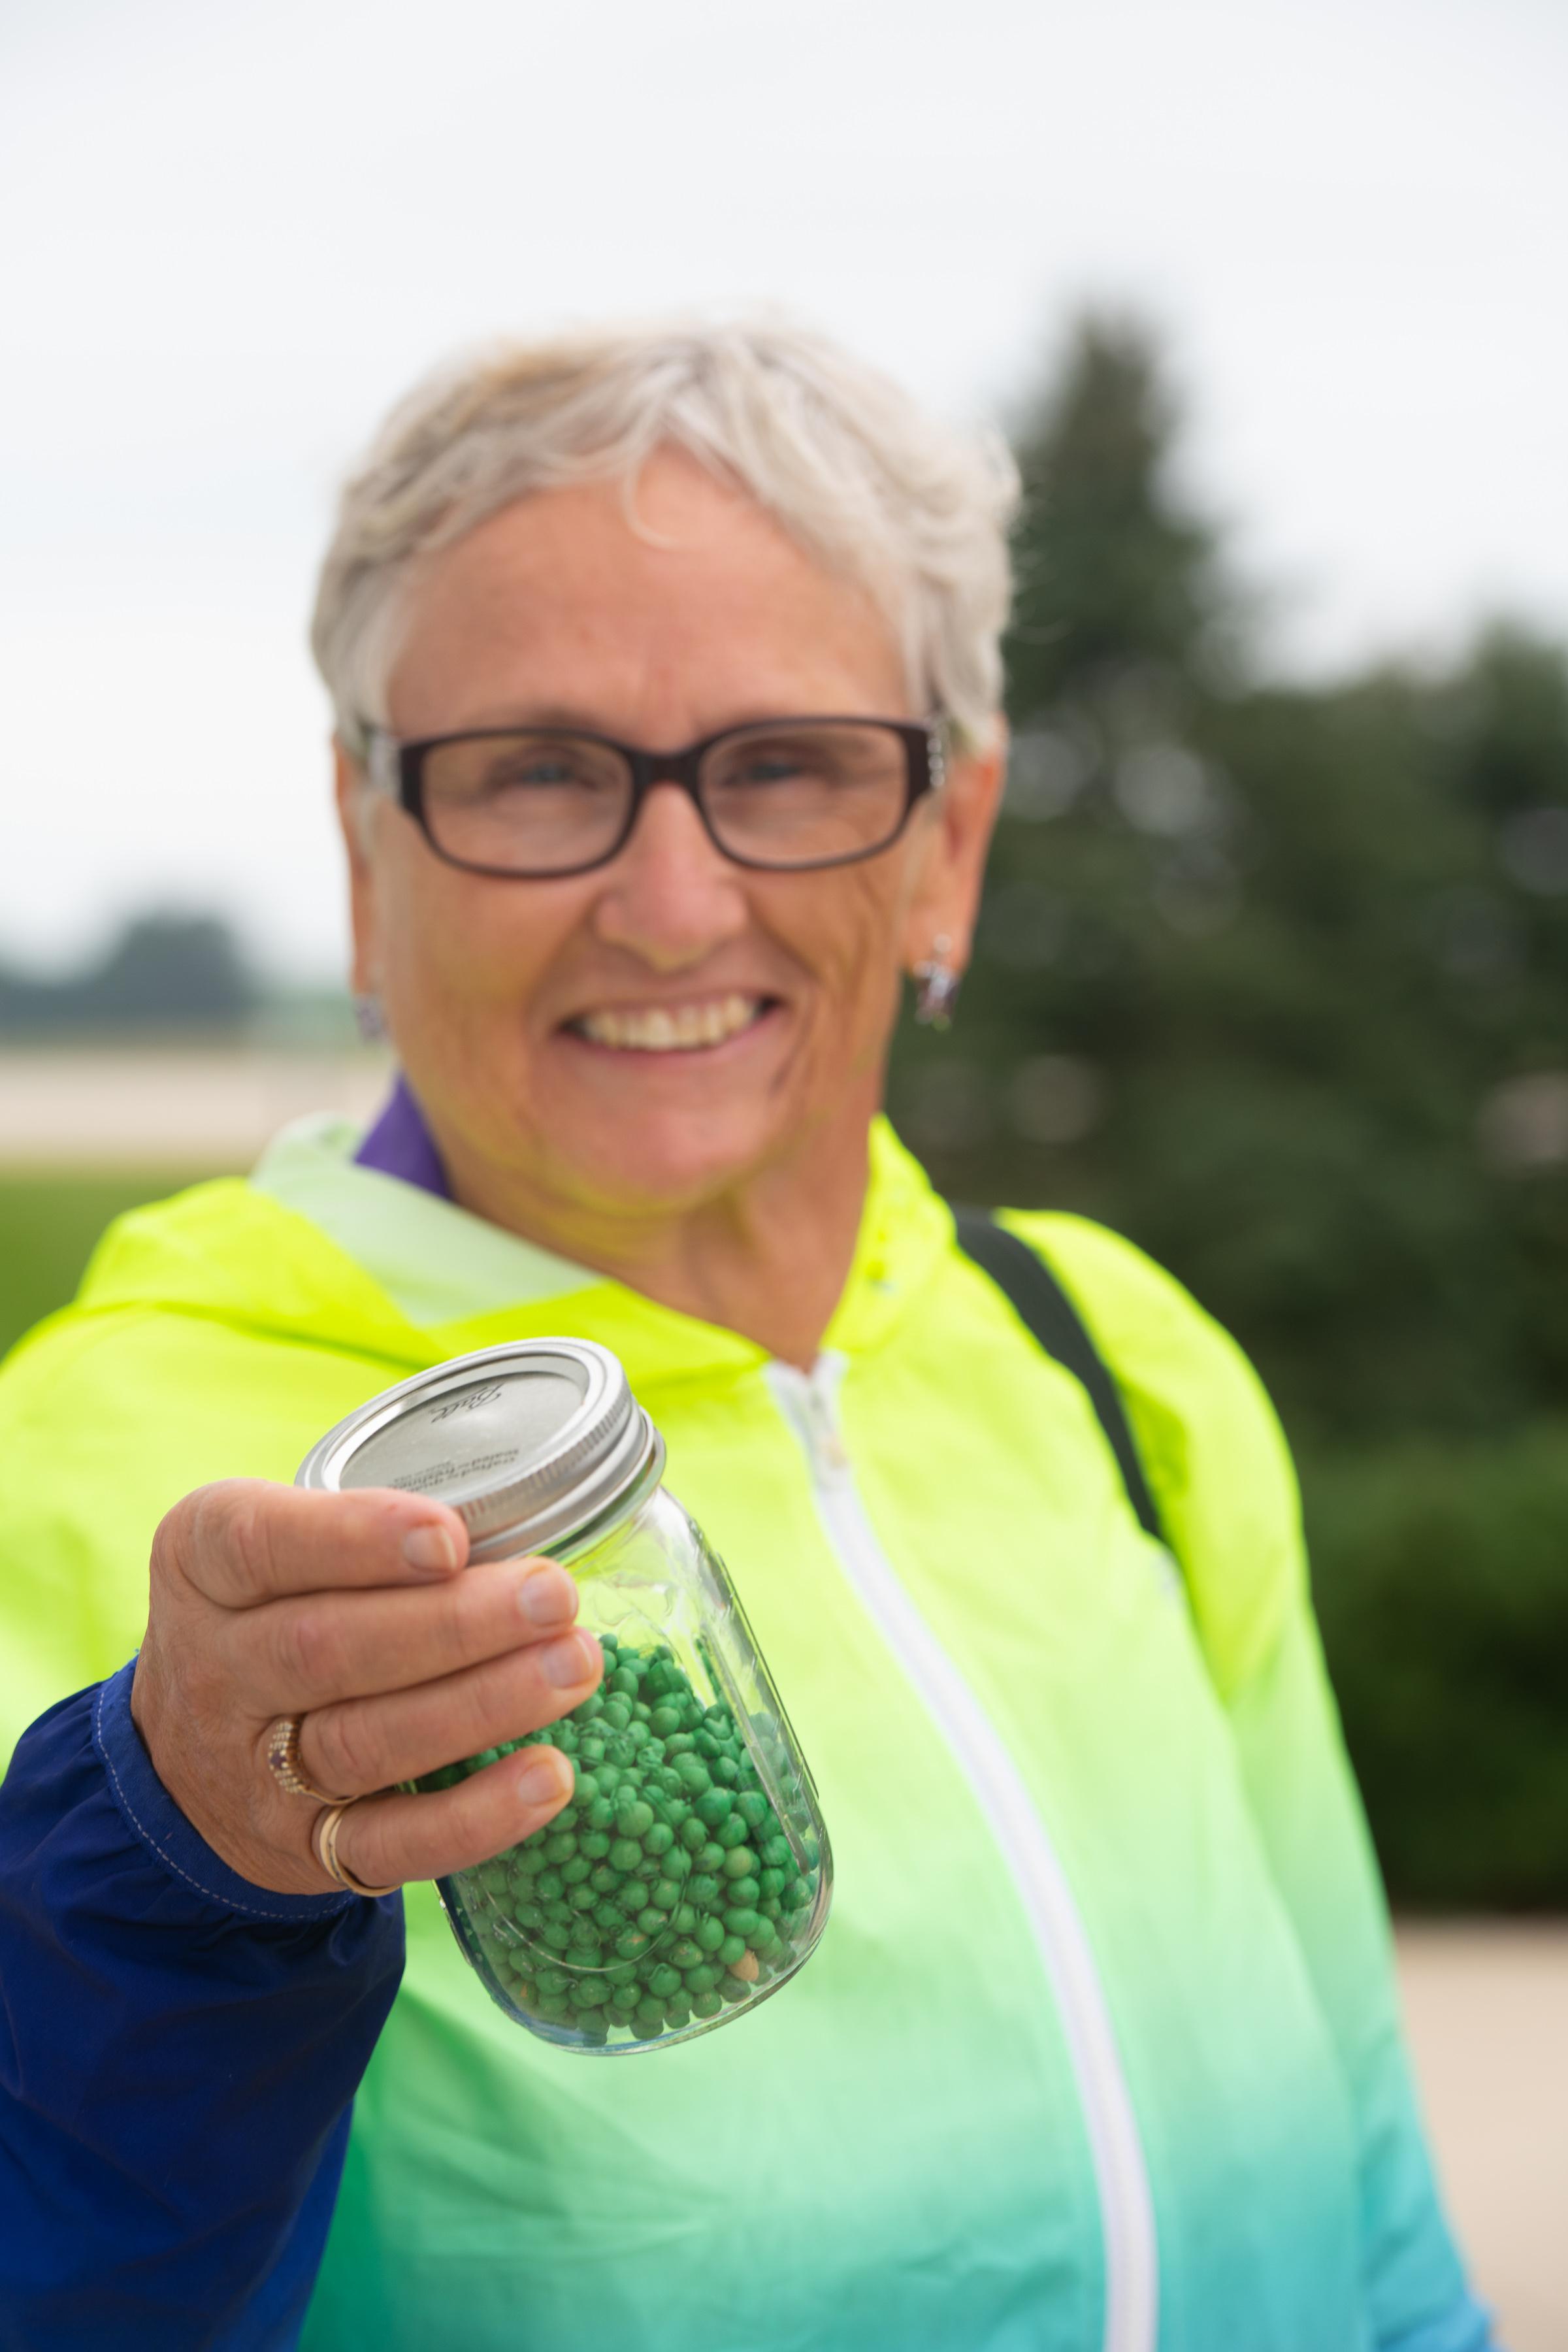 Participants got an up-close look at soybean seeds and corn kernels. Photo credit: Joseph L. Murphy/Iowa Soybean Association